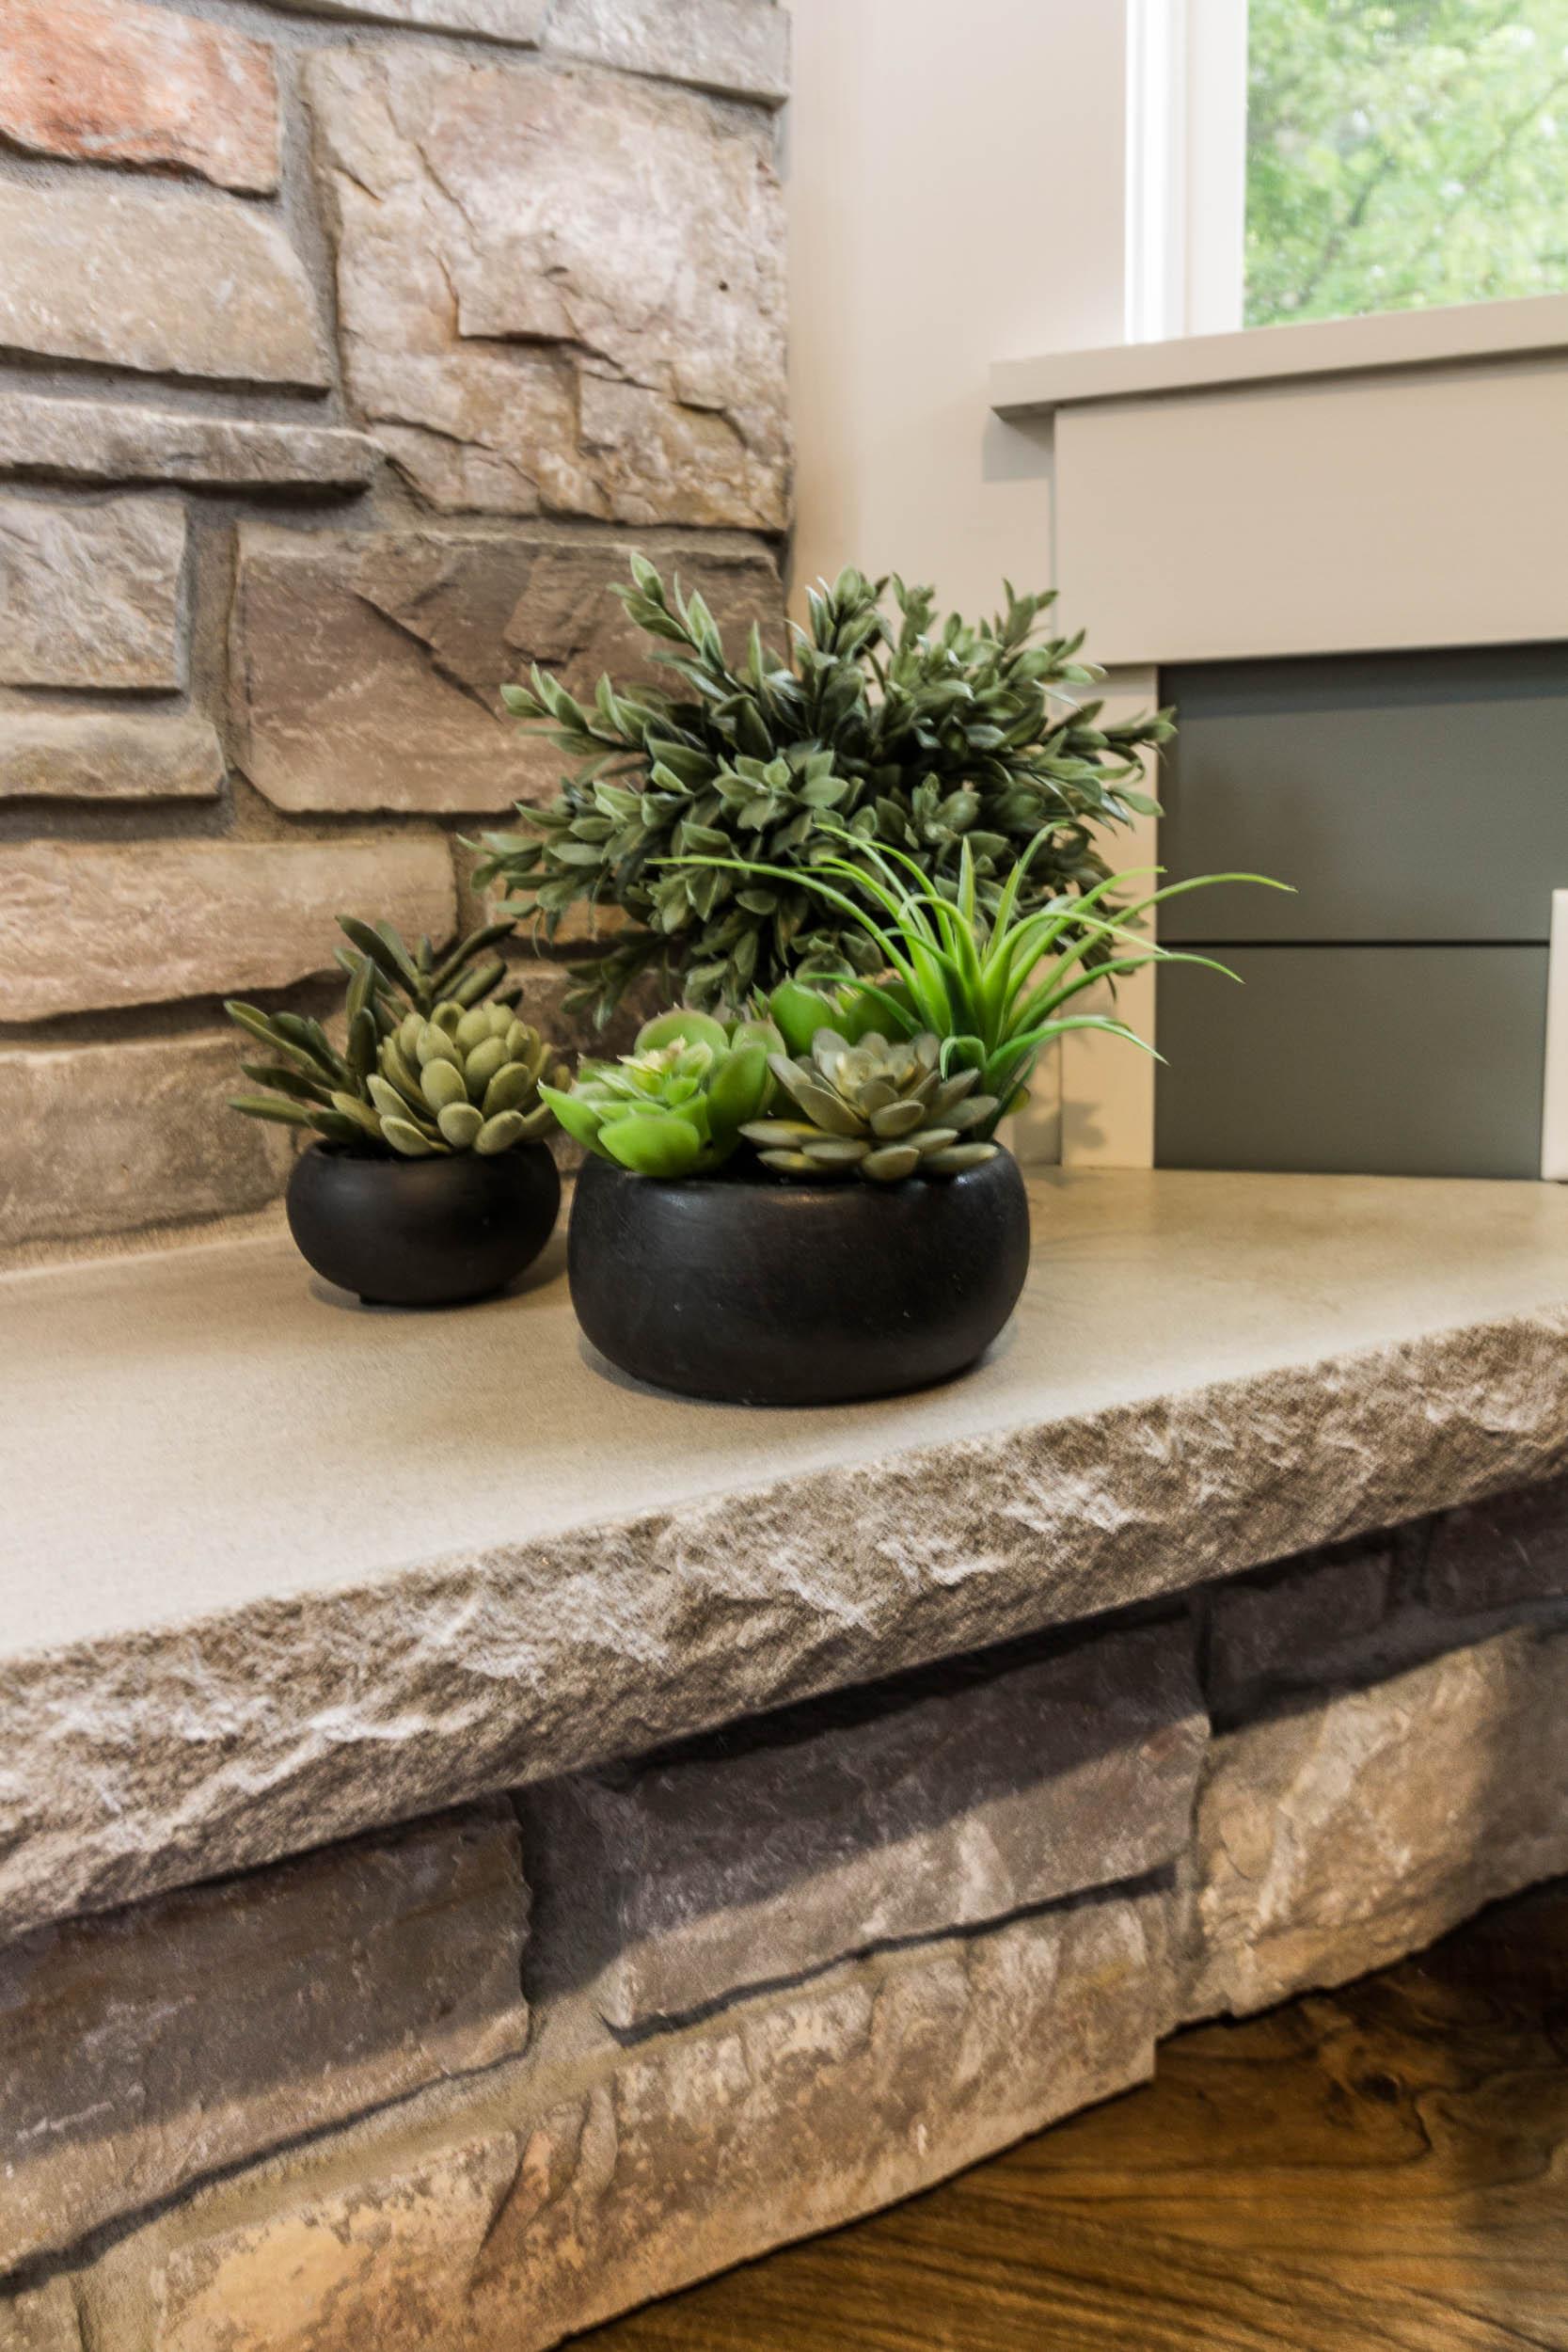 Halquist Maple Bluff Natural Stone Veneer Fireplace Surround